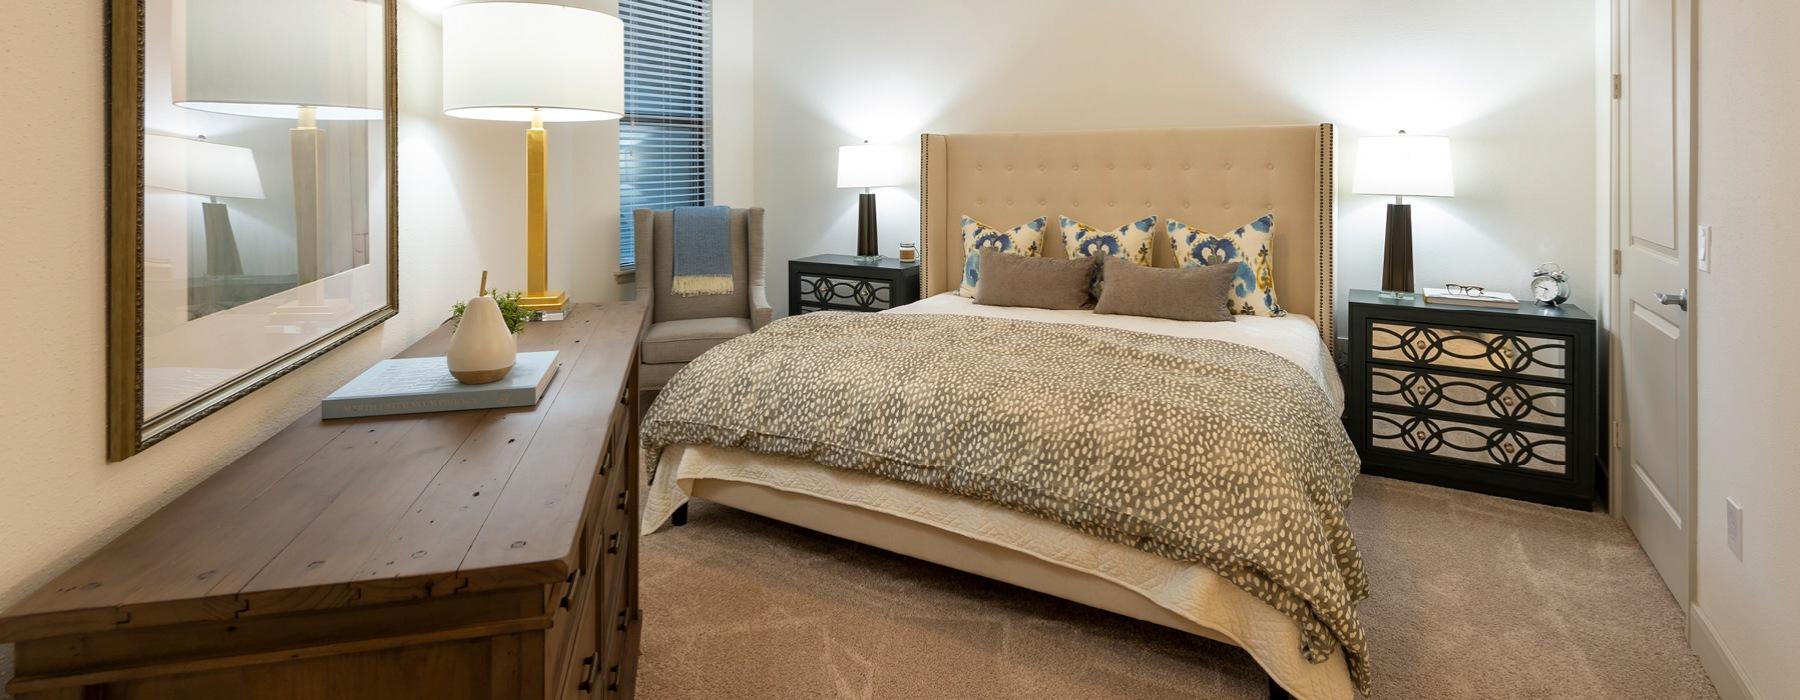 bedroom with ceiling fan, lighting fixture and window